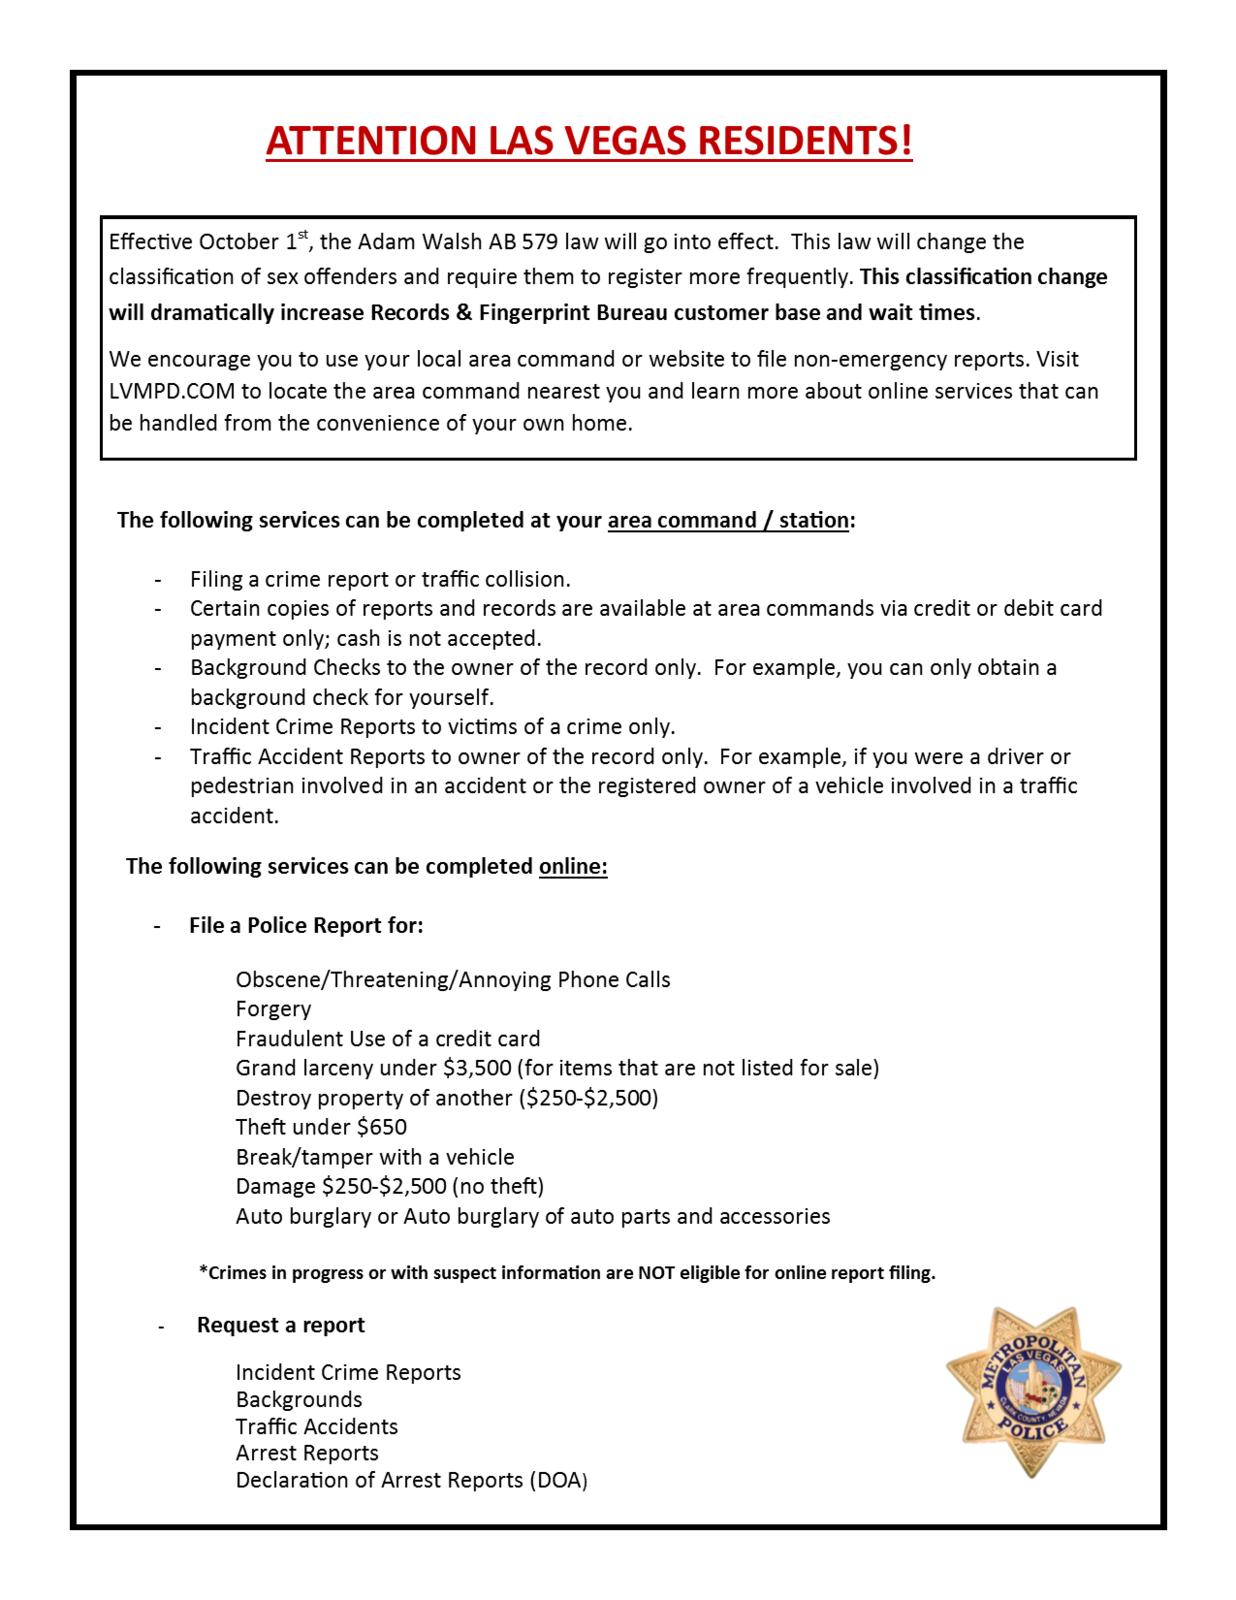 Filing a Police Report (Las Vegas Metropolitan Police Department